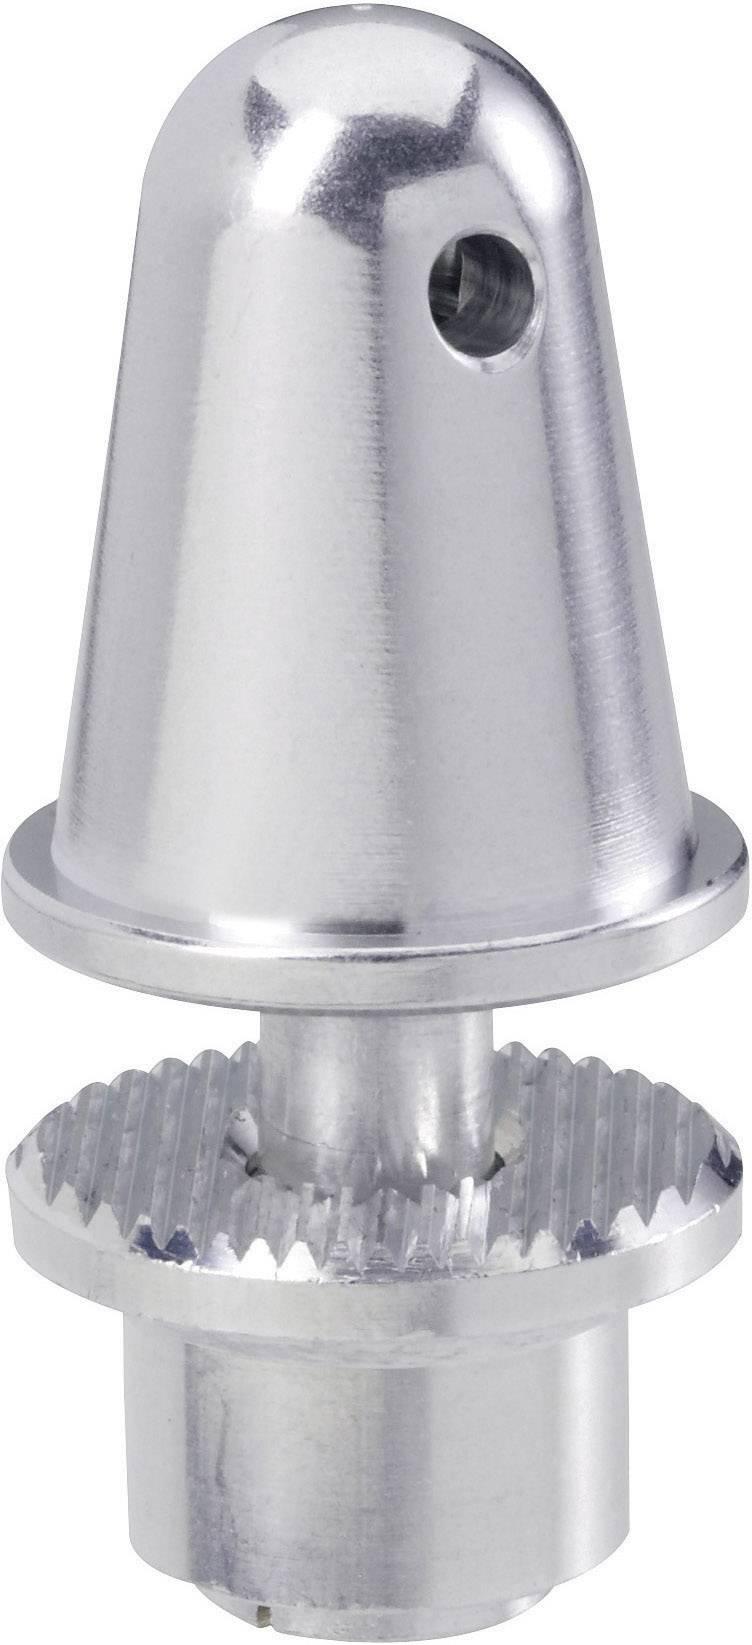 Unašeč vrtule Reely, Ø 16 mm, 2,3 mm